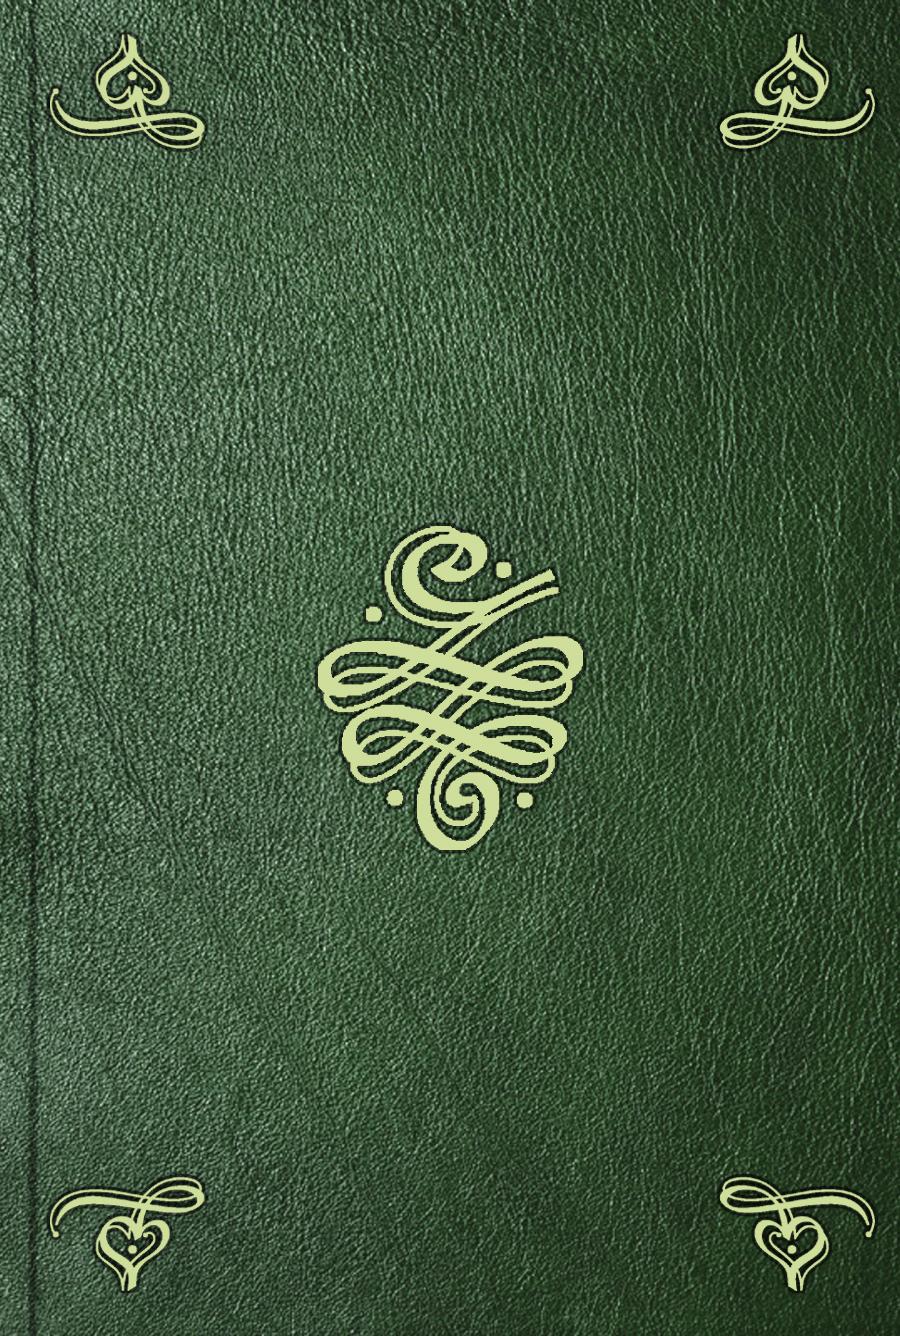 Ennio Quirino Visconti Opere varie italiane e francesi. Vol. 3 ghost vol 3 2013 tpb